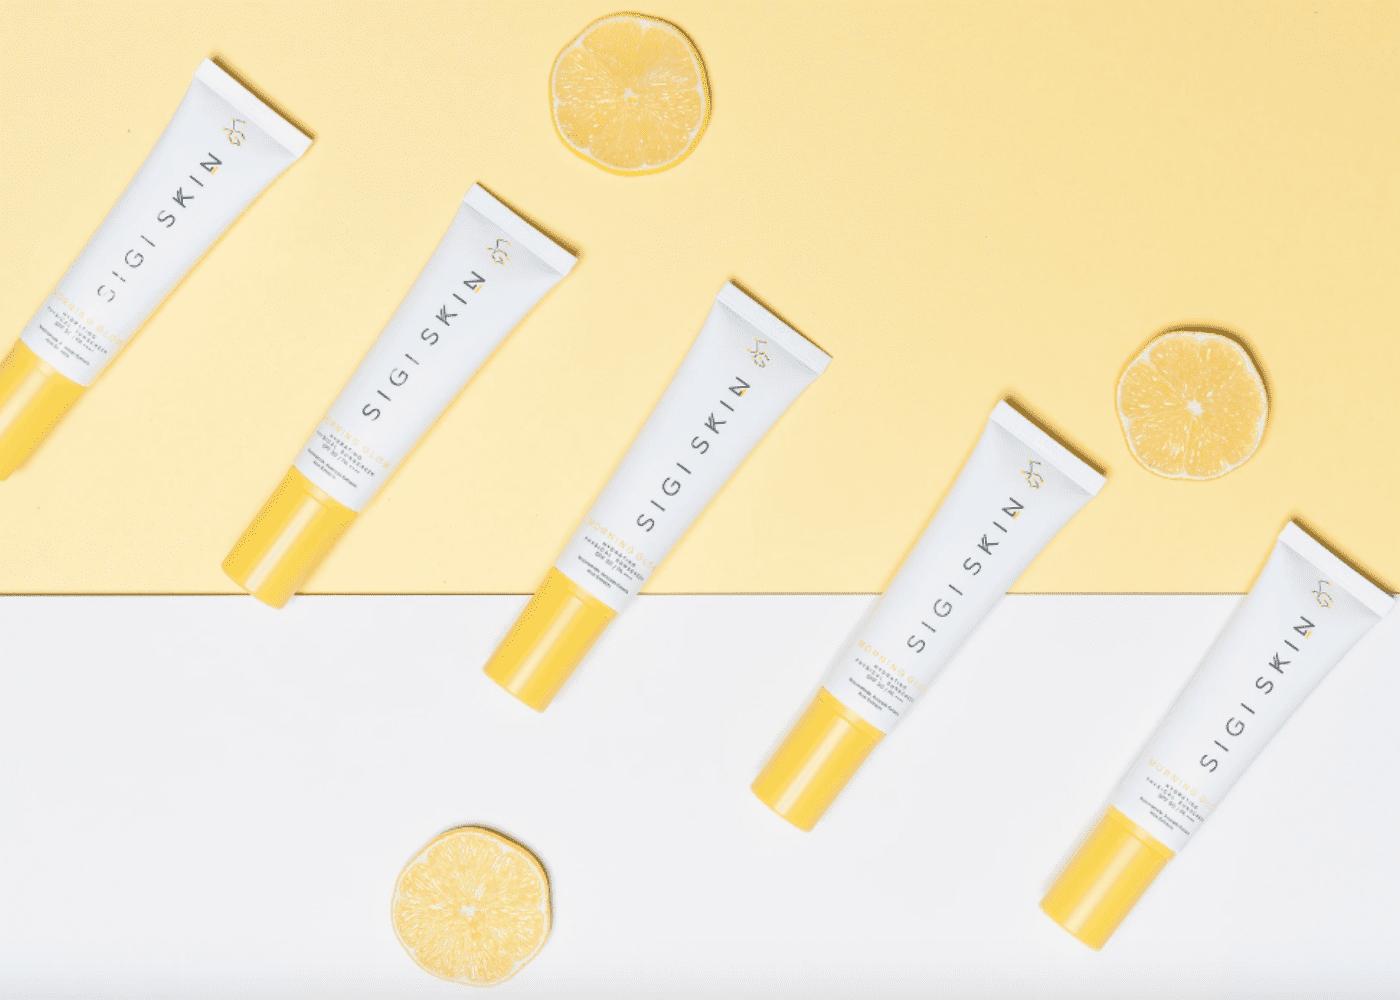 Sigi Skin Morning Glow Physical Sunscreen | best sunscreens for face